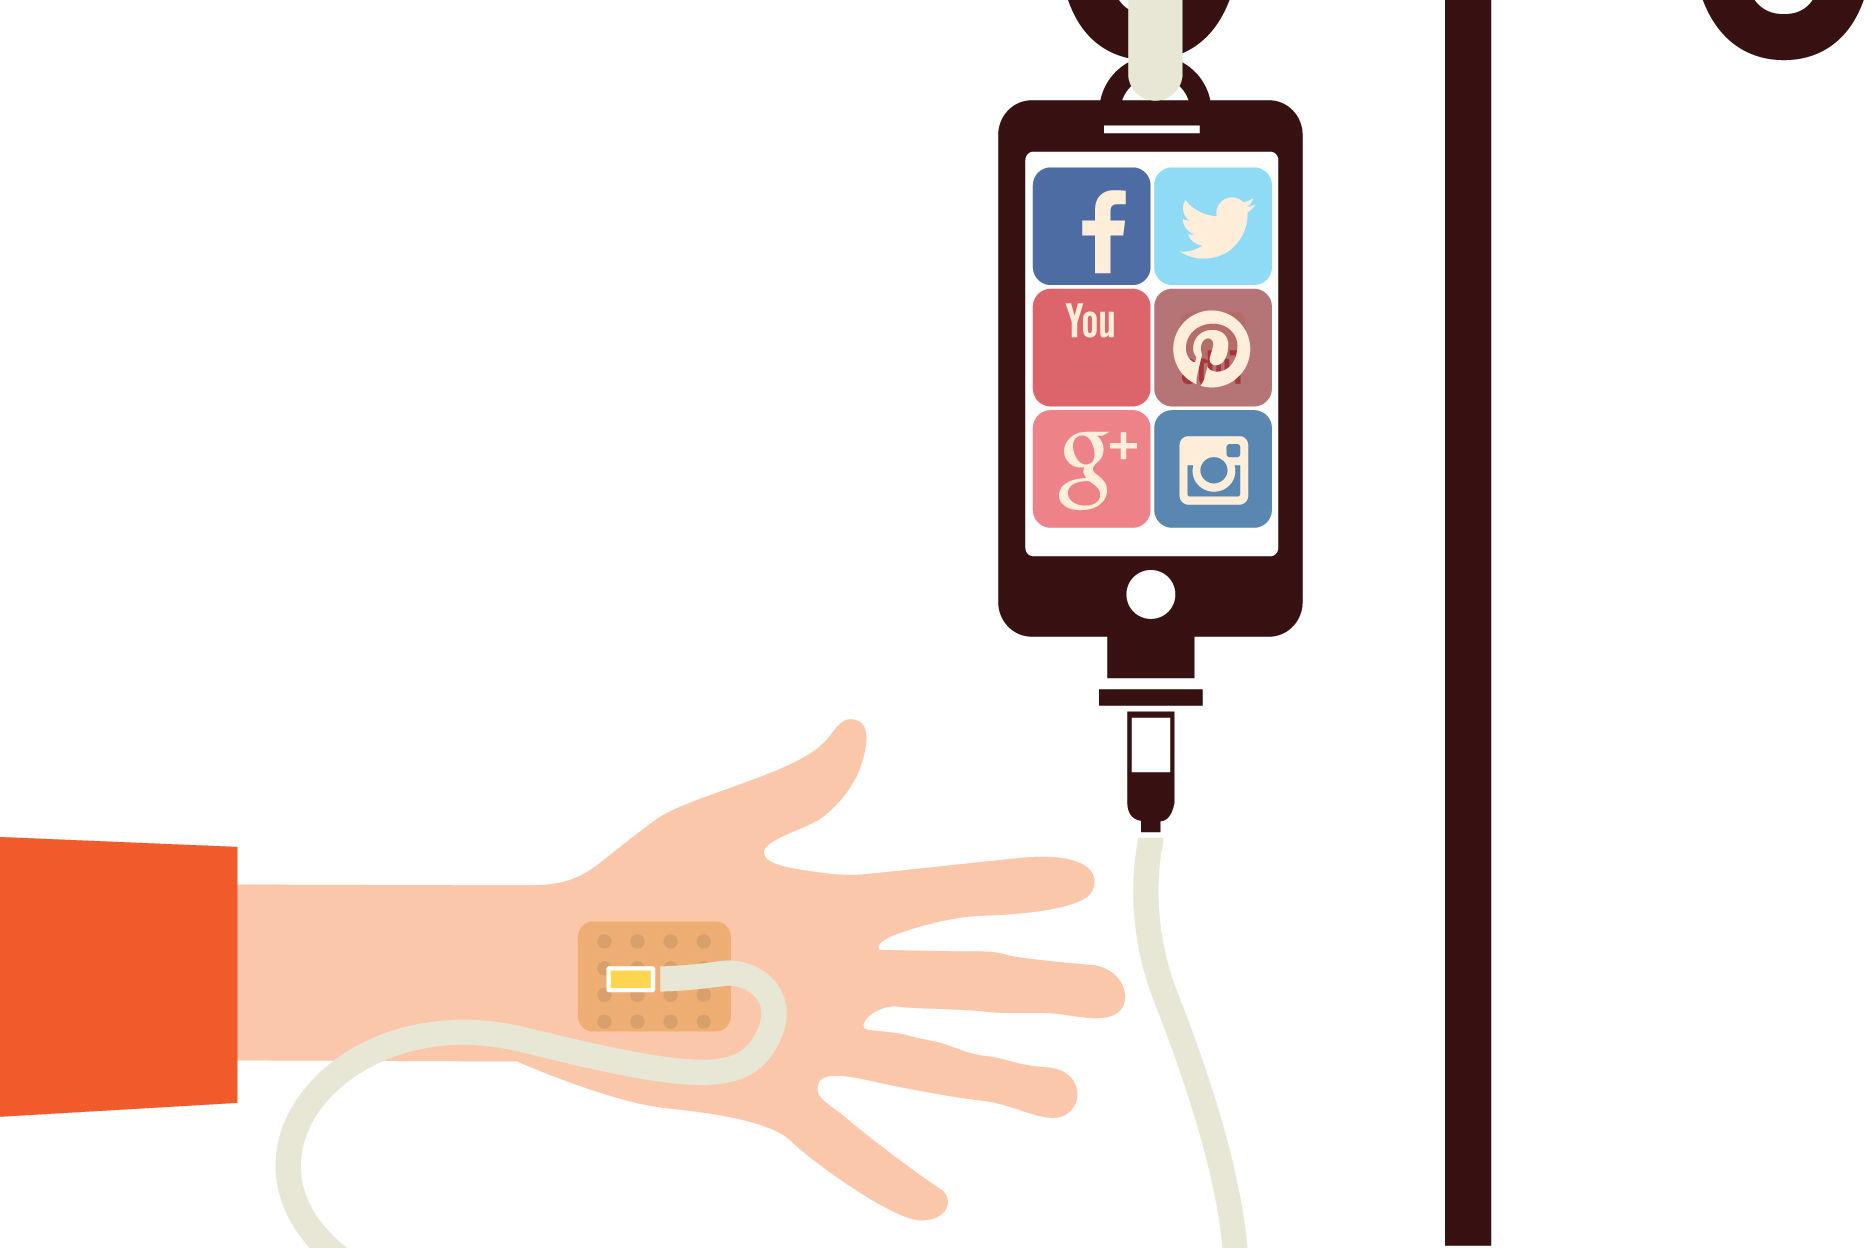 Jis 0816 health social media rjdbfd